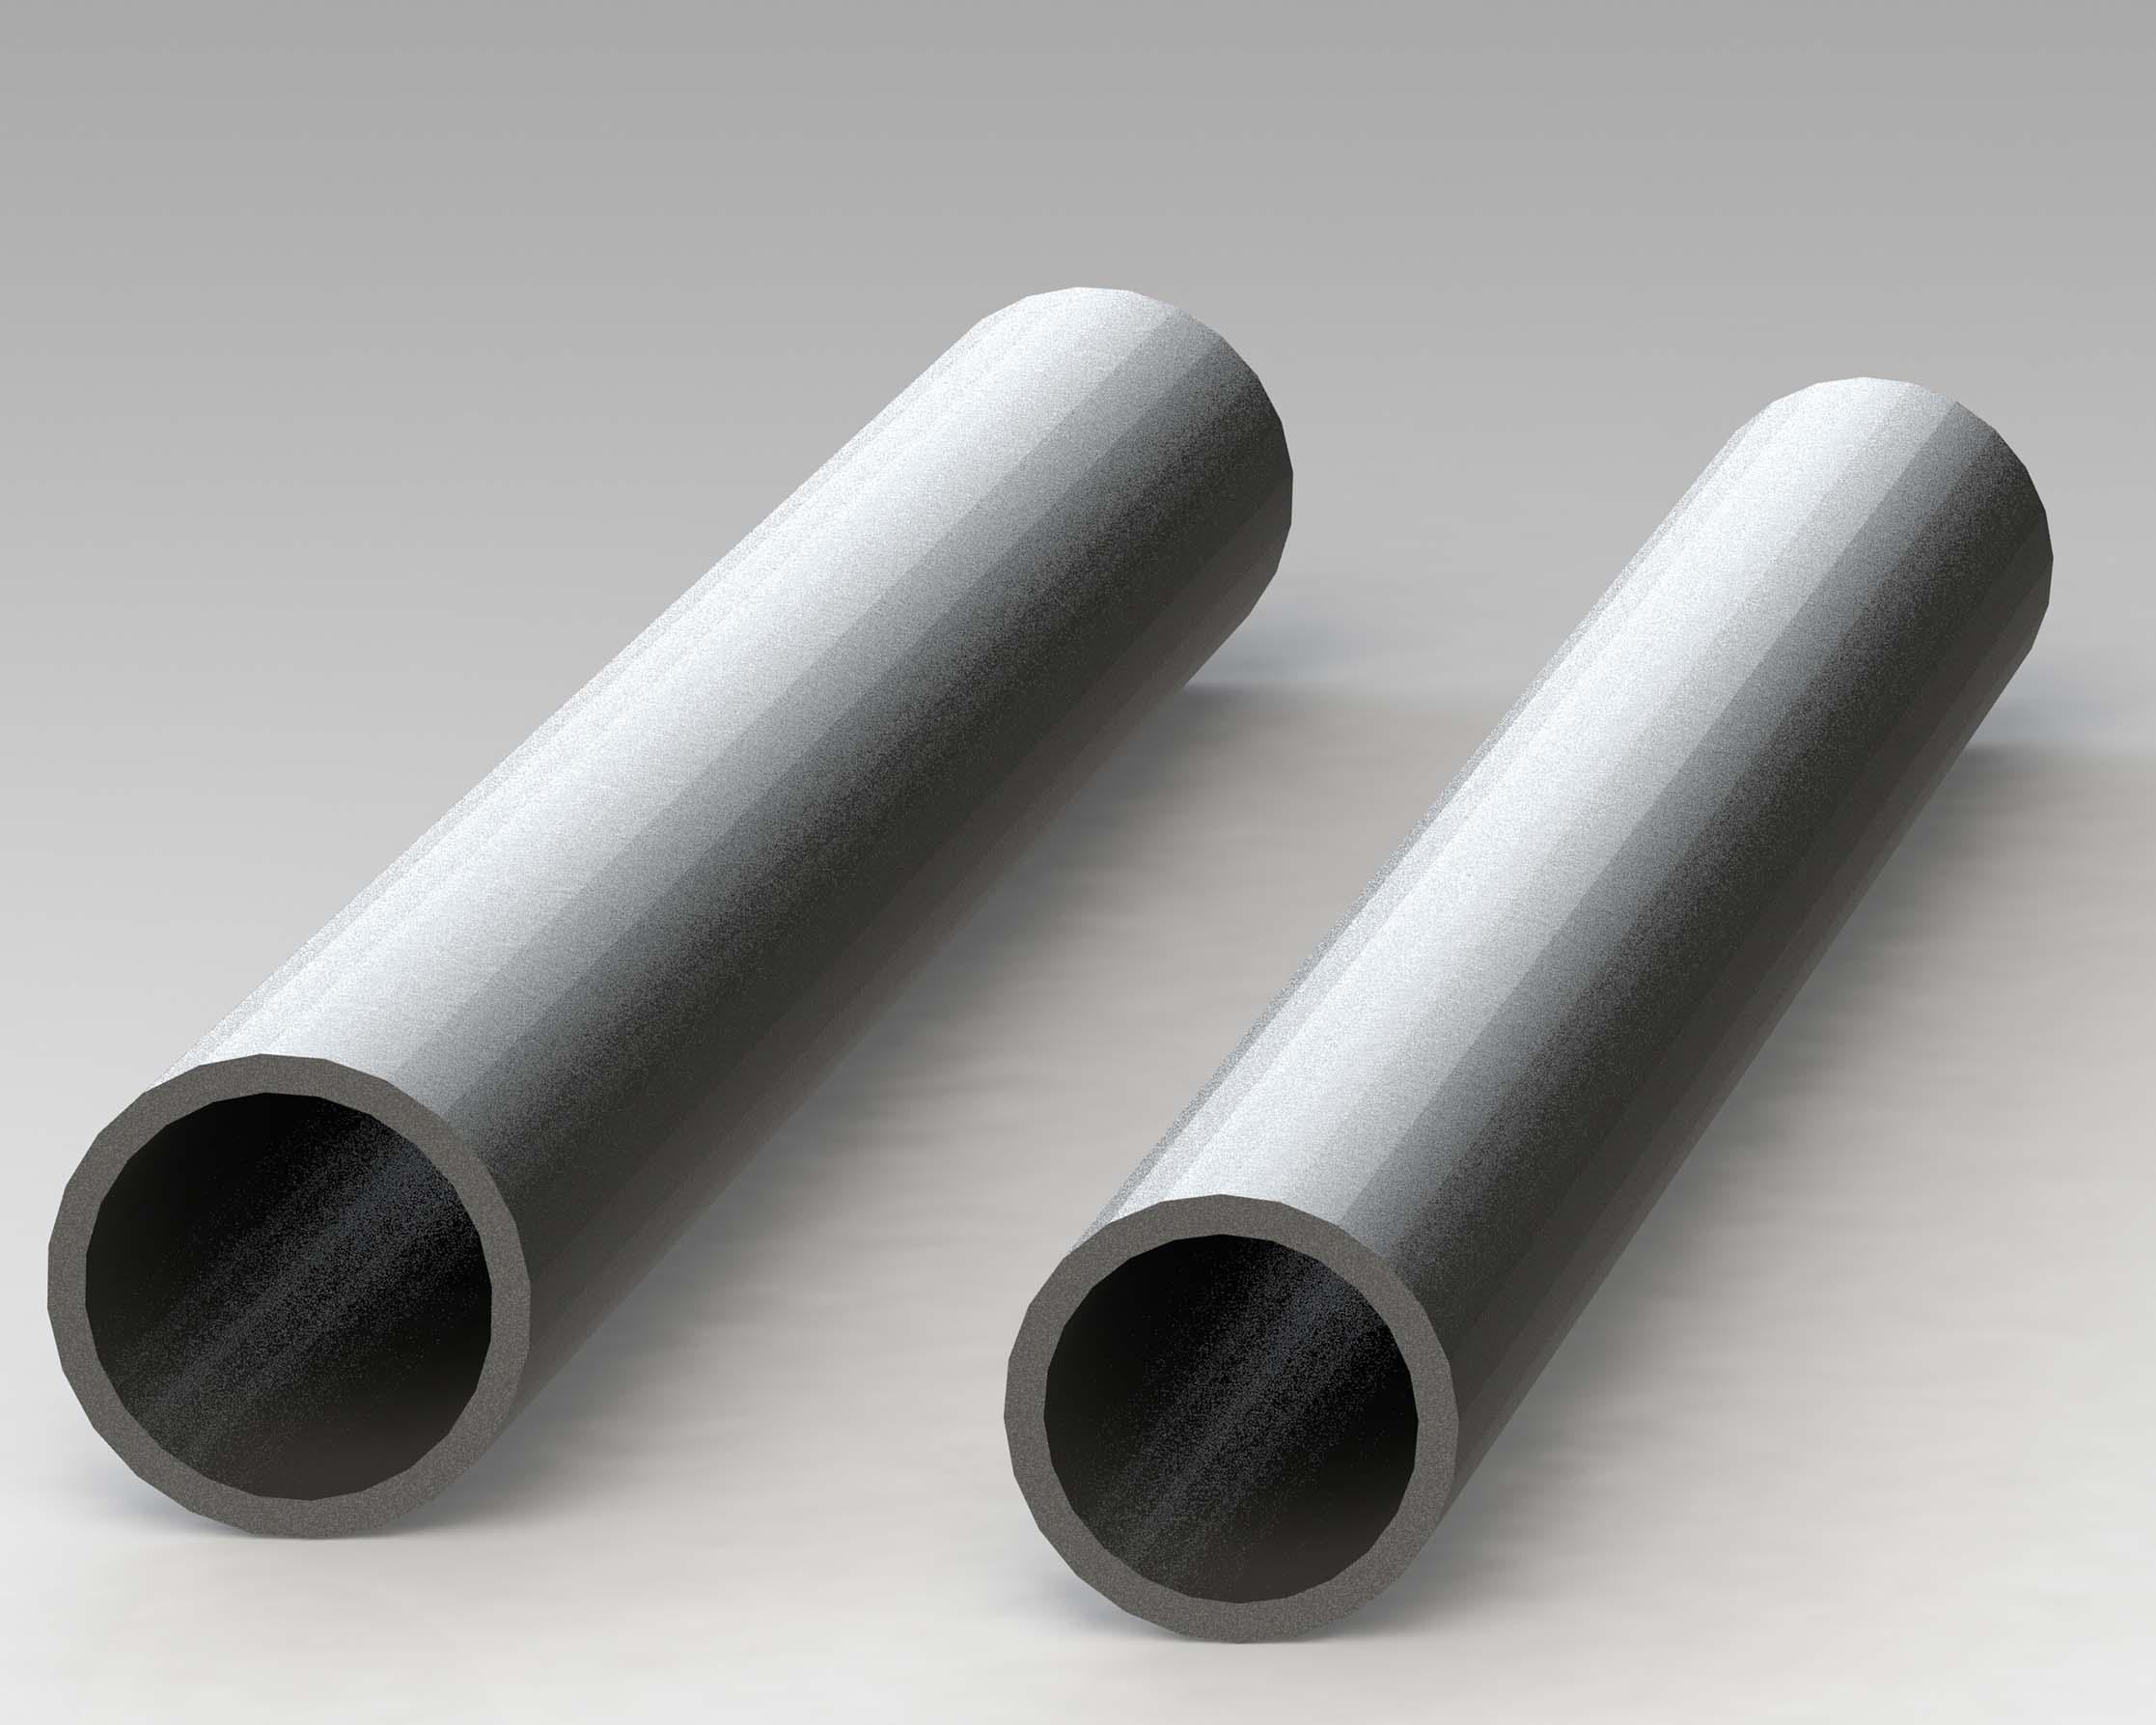 PEK3 Easytube Pipe and Joints Protectors HST 28.0 32.0